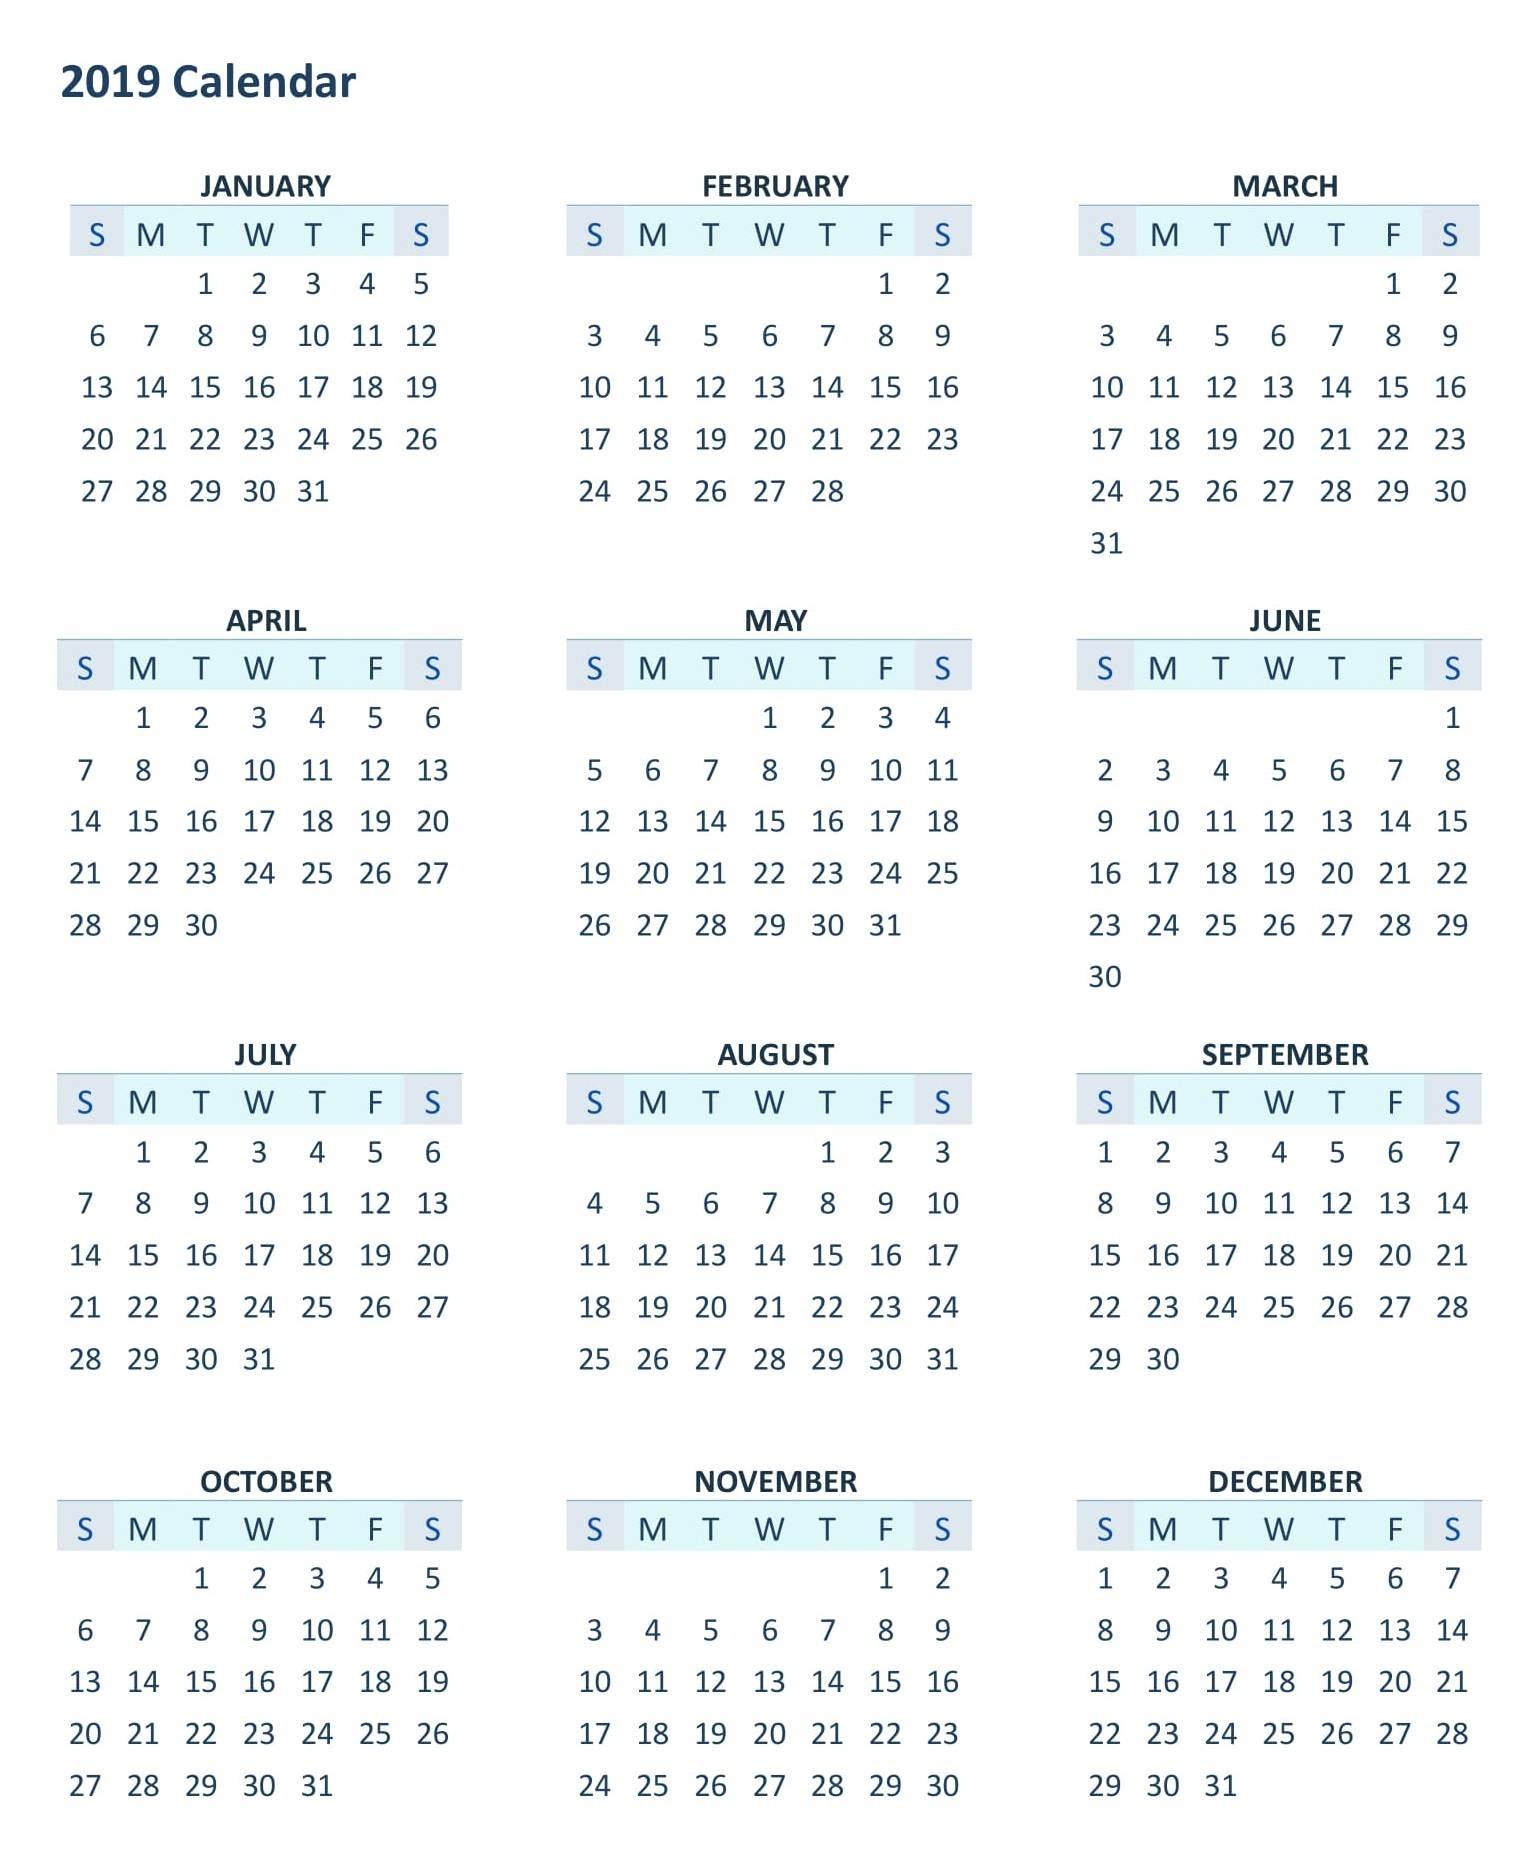 12 Month Calendar 2019 Template – Printable 2018 Calendars Templates pertaining to 12 Month Calendar Word Template